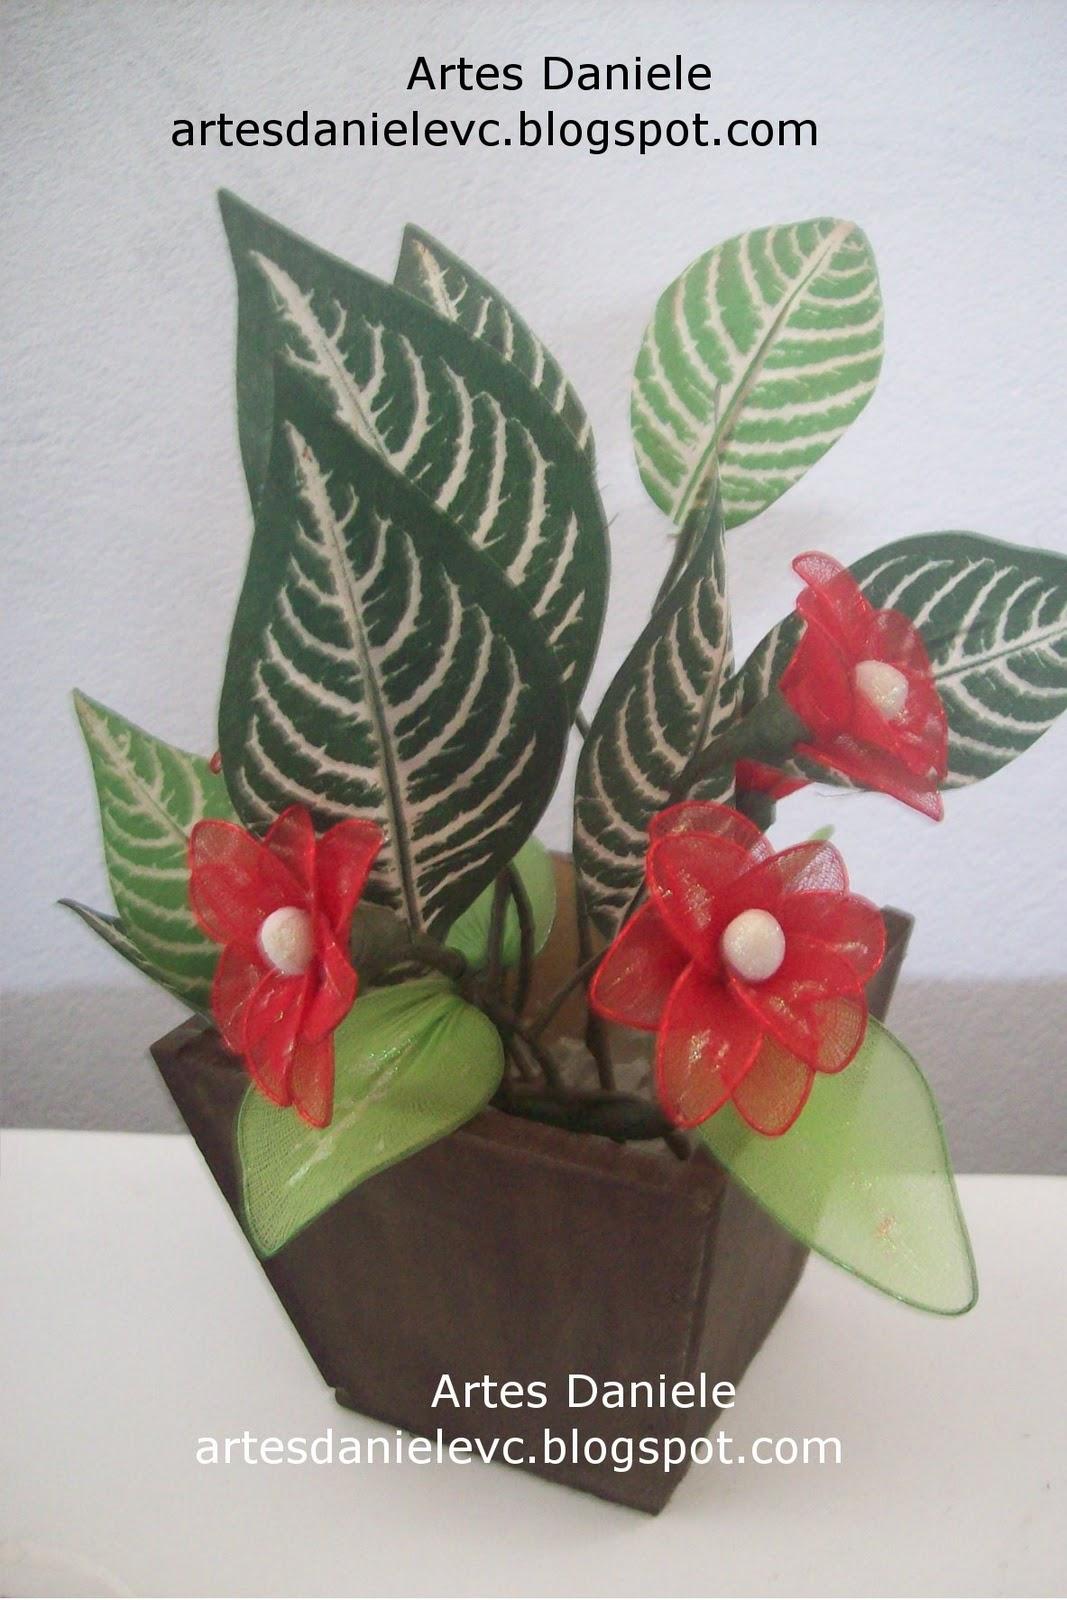 http://4.bp.blogspot.com/-qkO_tjNRaH8/Tnsy-J9qc_I/AAAAAAAADlY/Y5WDd7eRH4c/s1600/vaso+margaridas+2.jpg